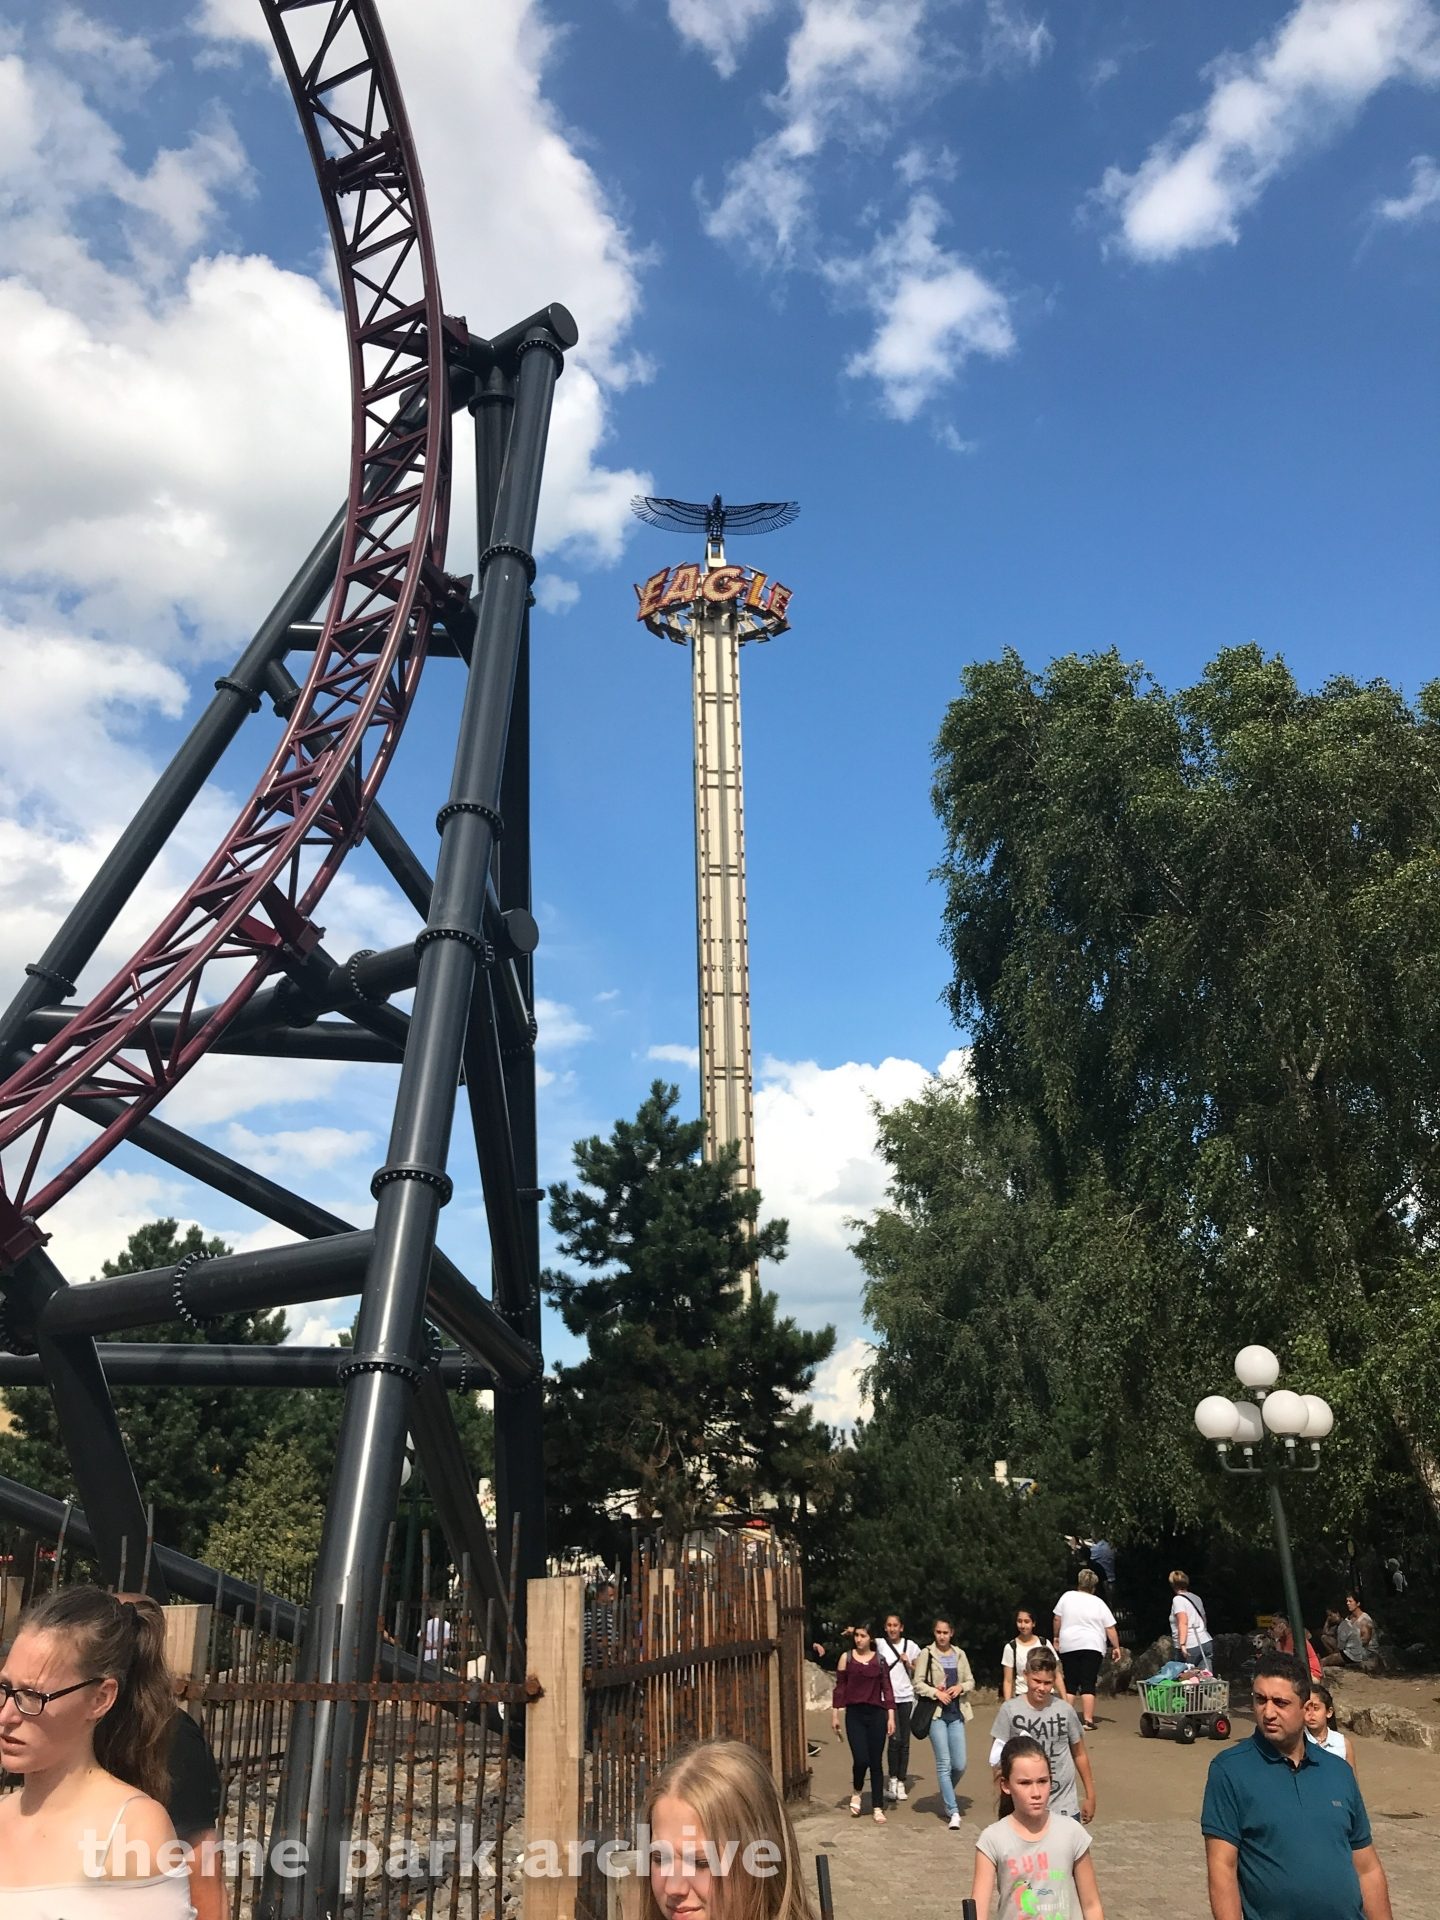 The Eagle at Attractiepark Slagharen